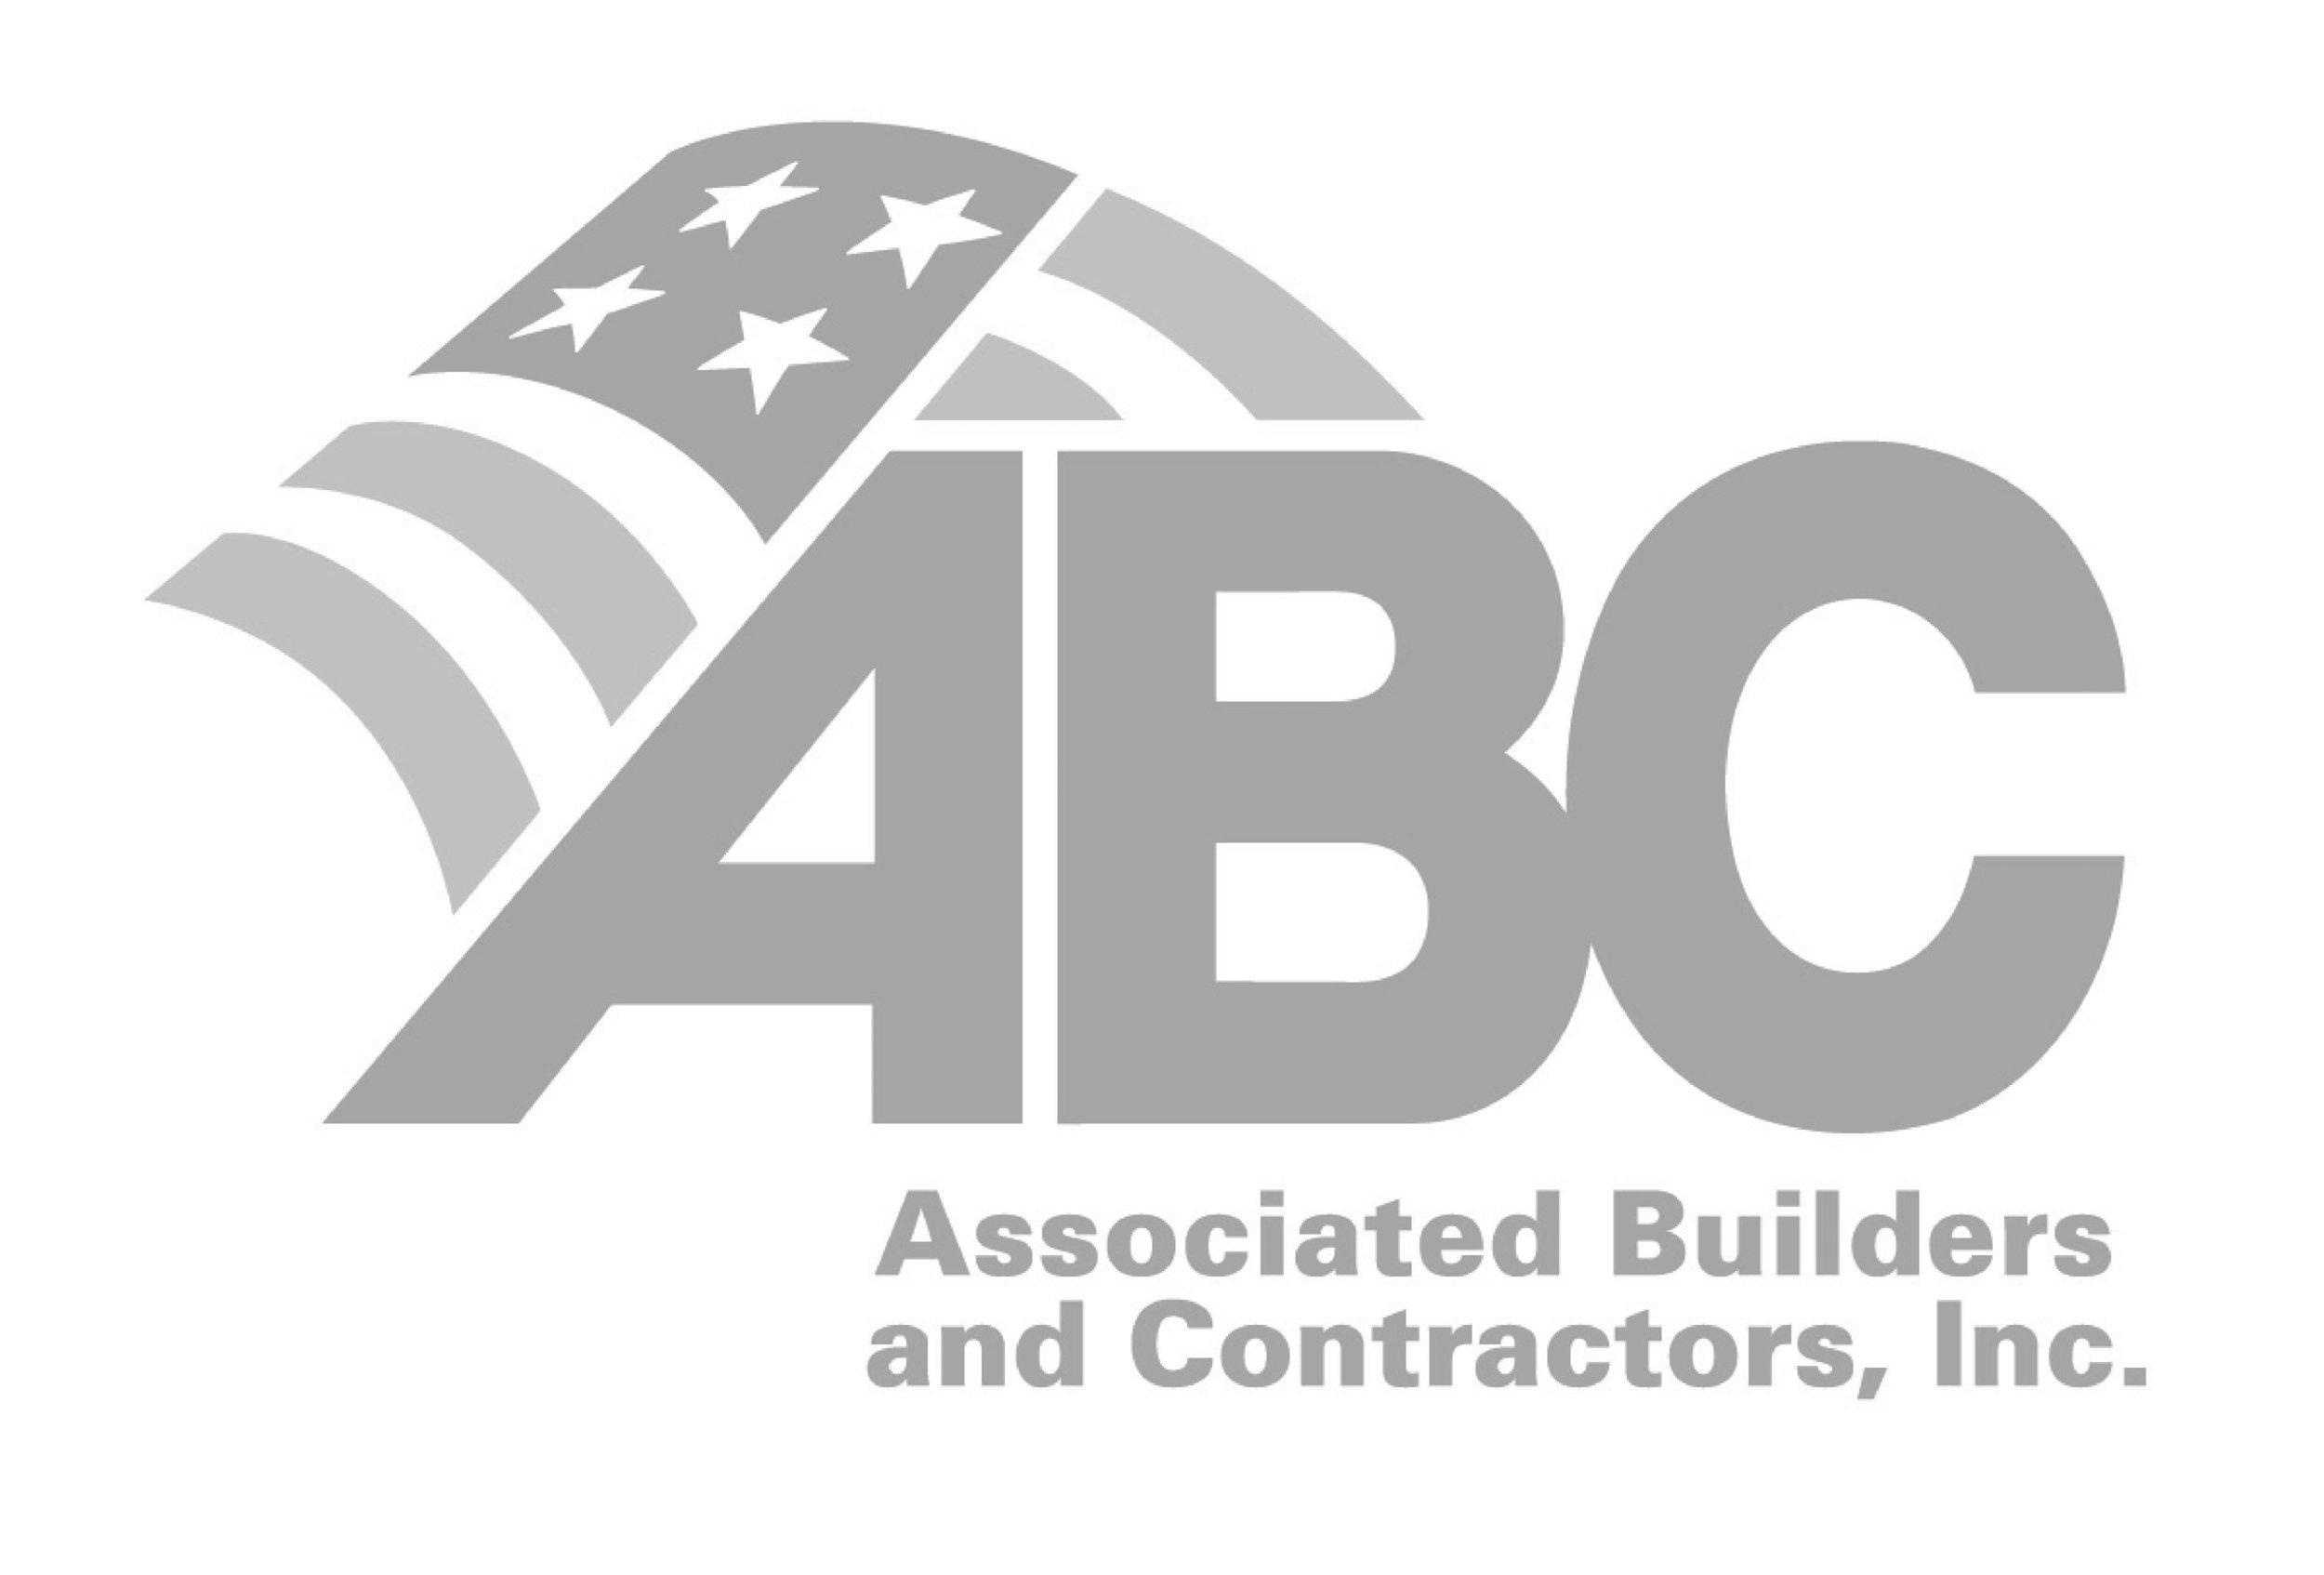 abc_website.jpg